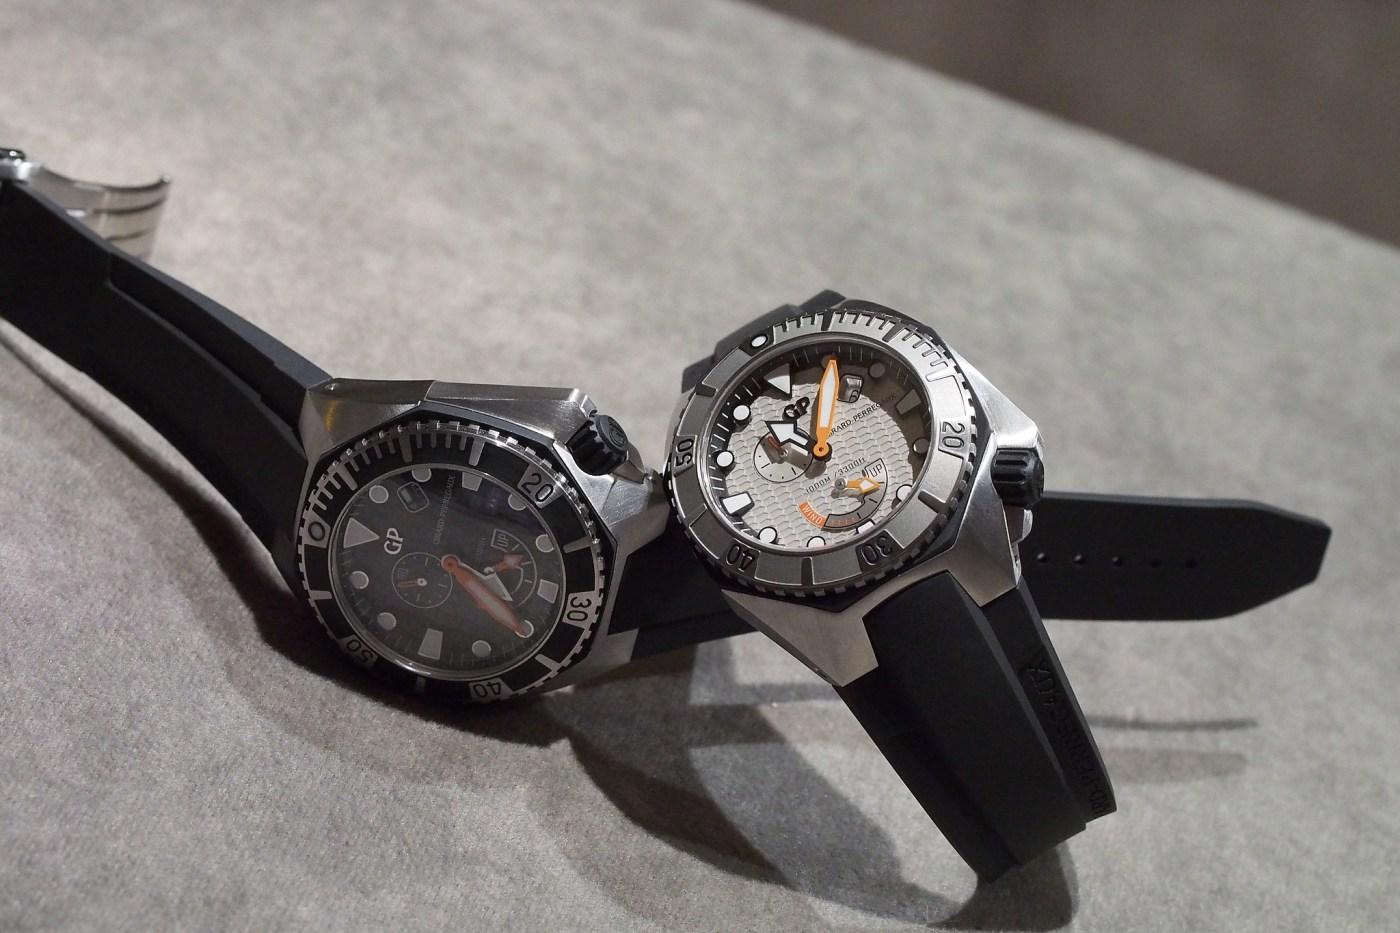 Girard-Perregaux Sea Hawk light gray and black dials